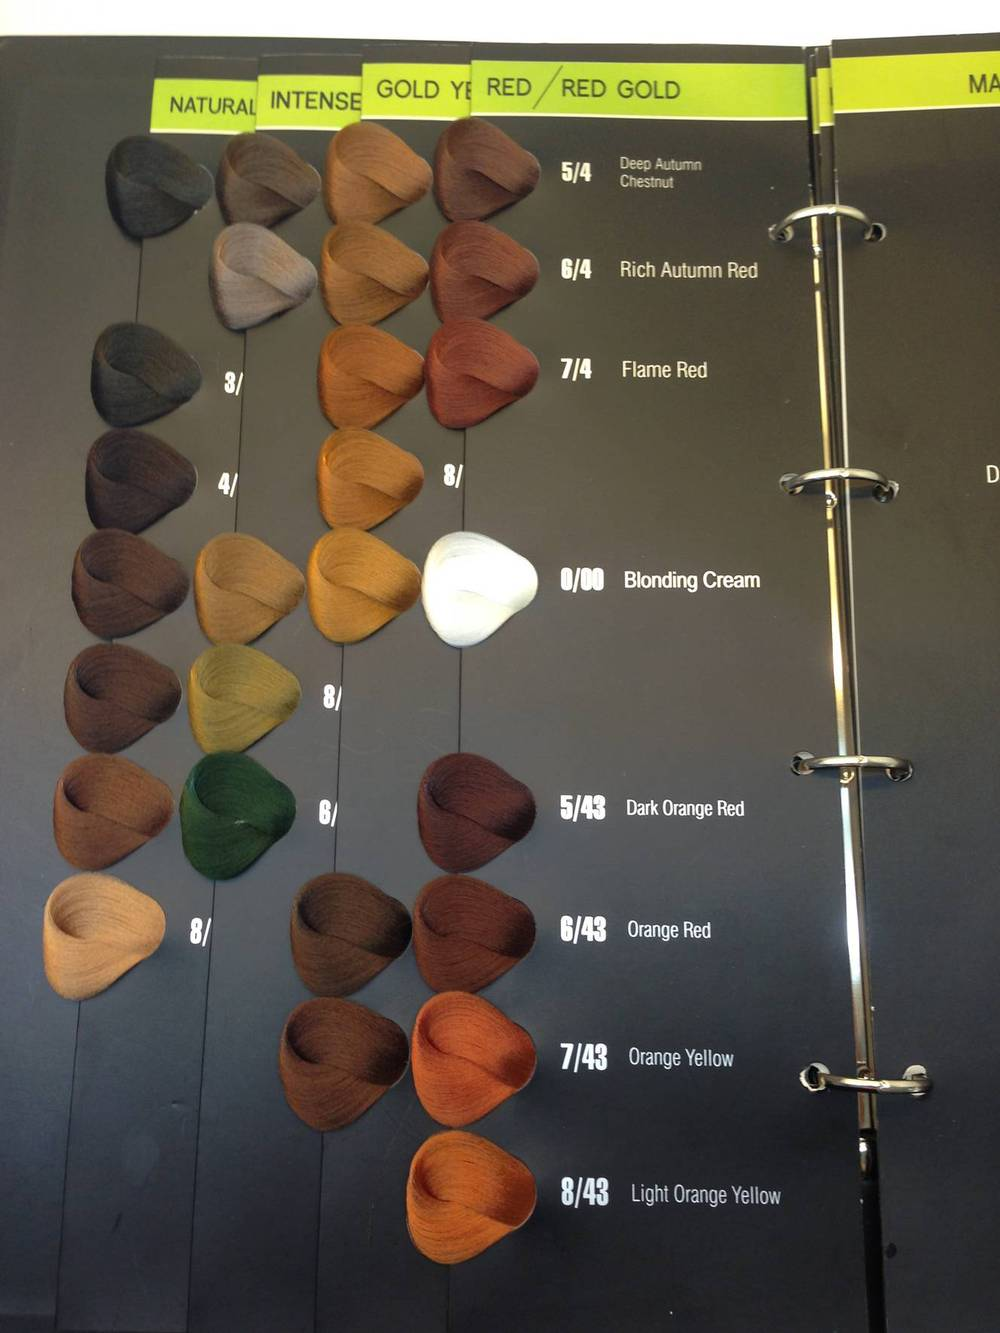 Oem Hair Color Swatch Book Salon Hair Color Chart - Buy Hair Color ...